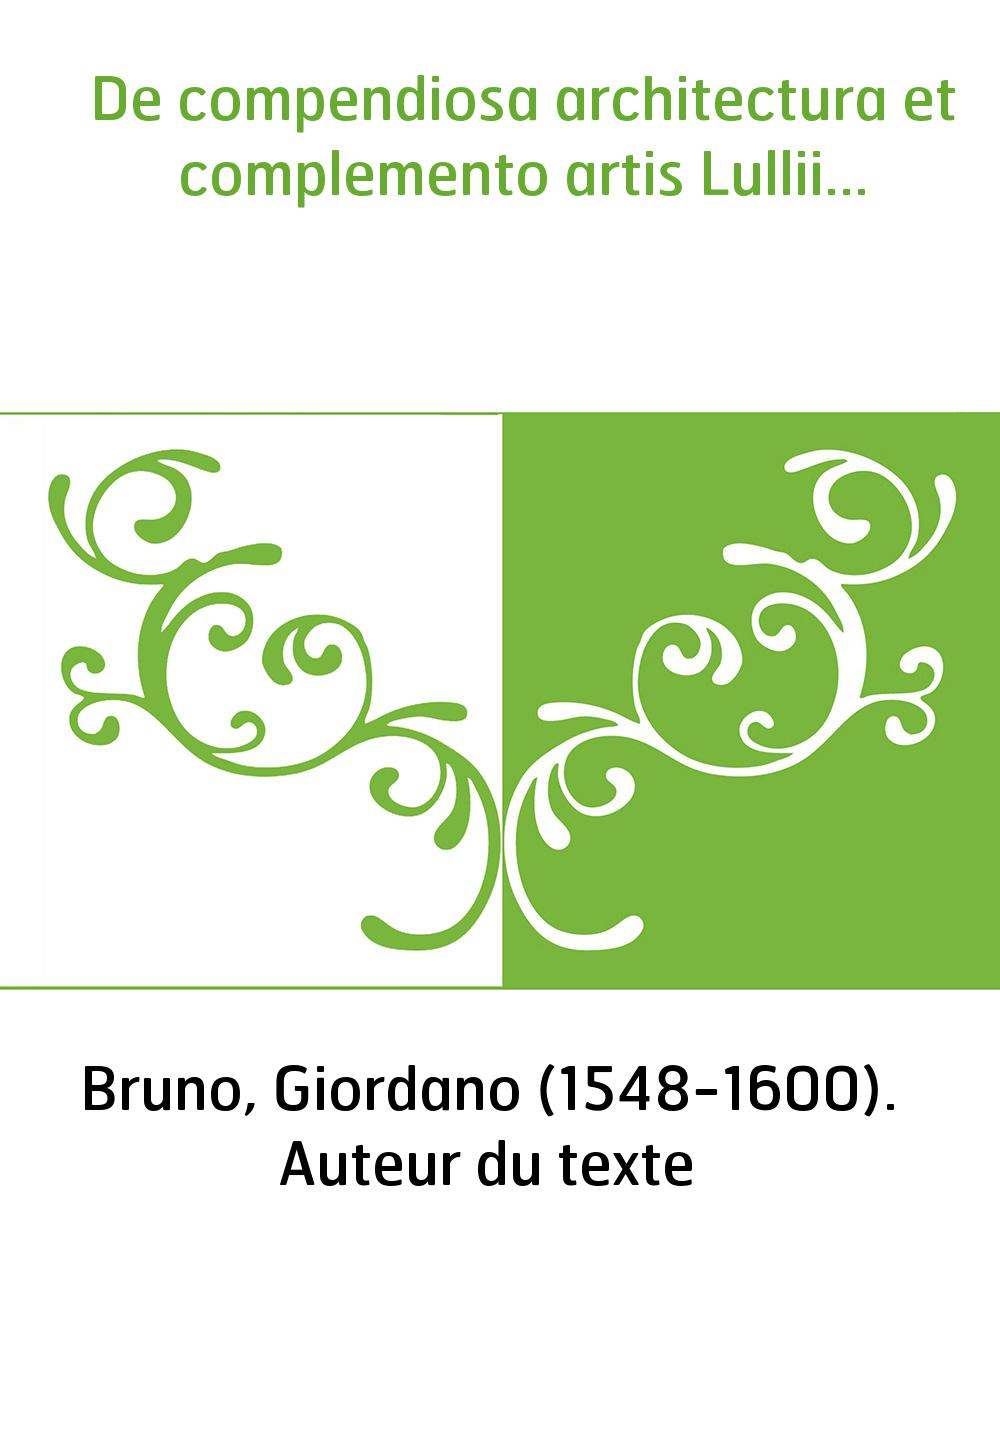 De compendiosa architectura et complemento artis Lullii...